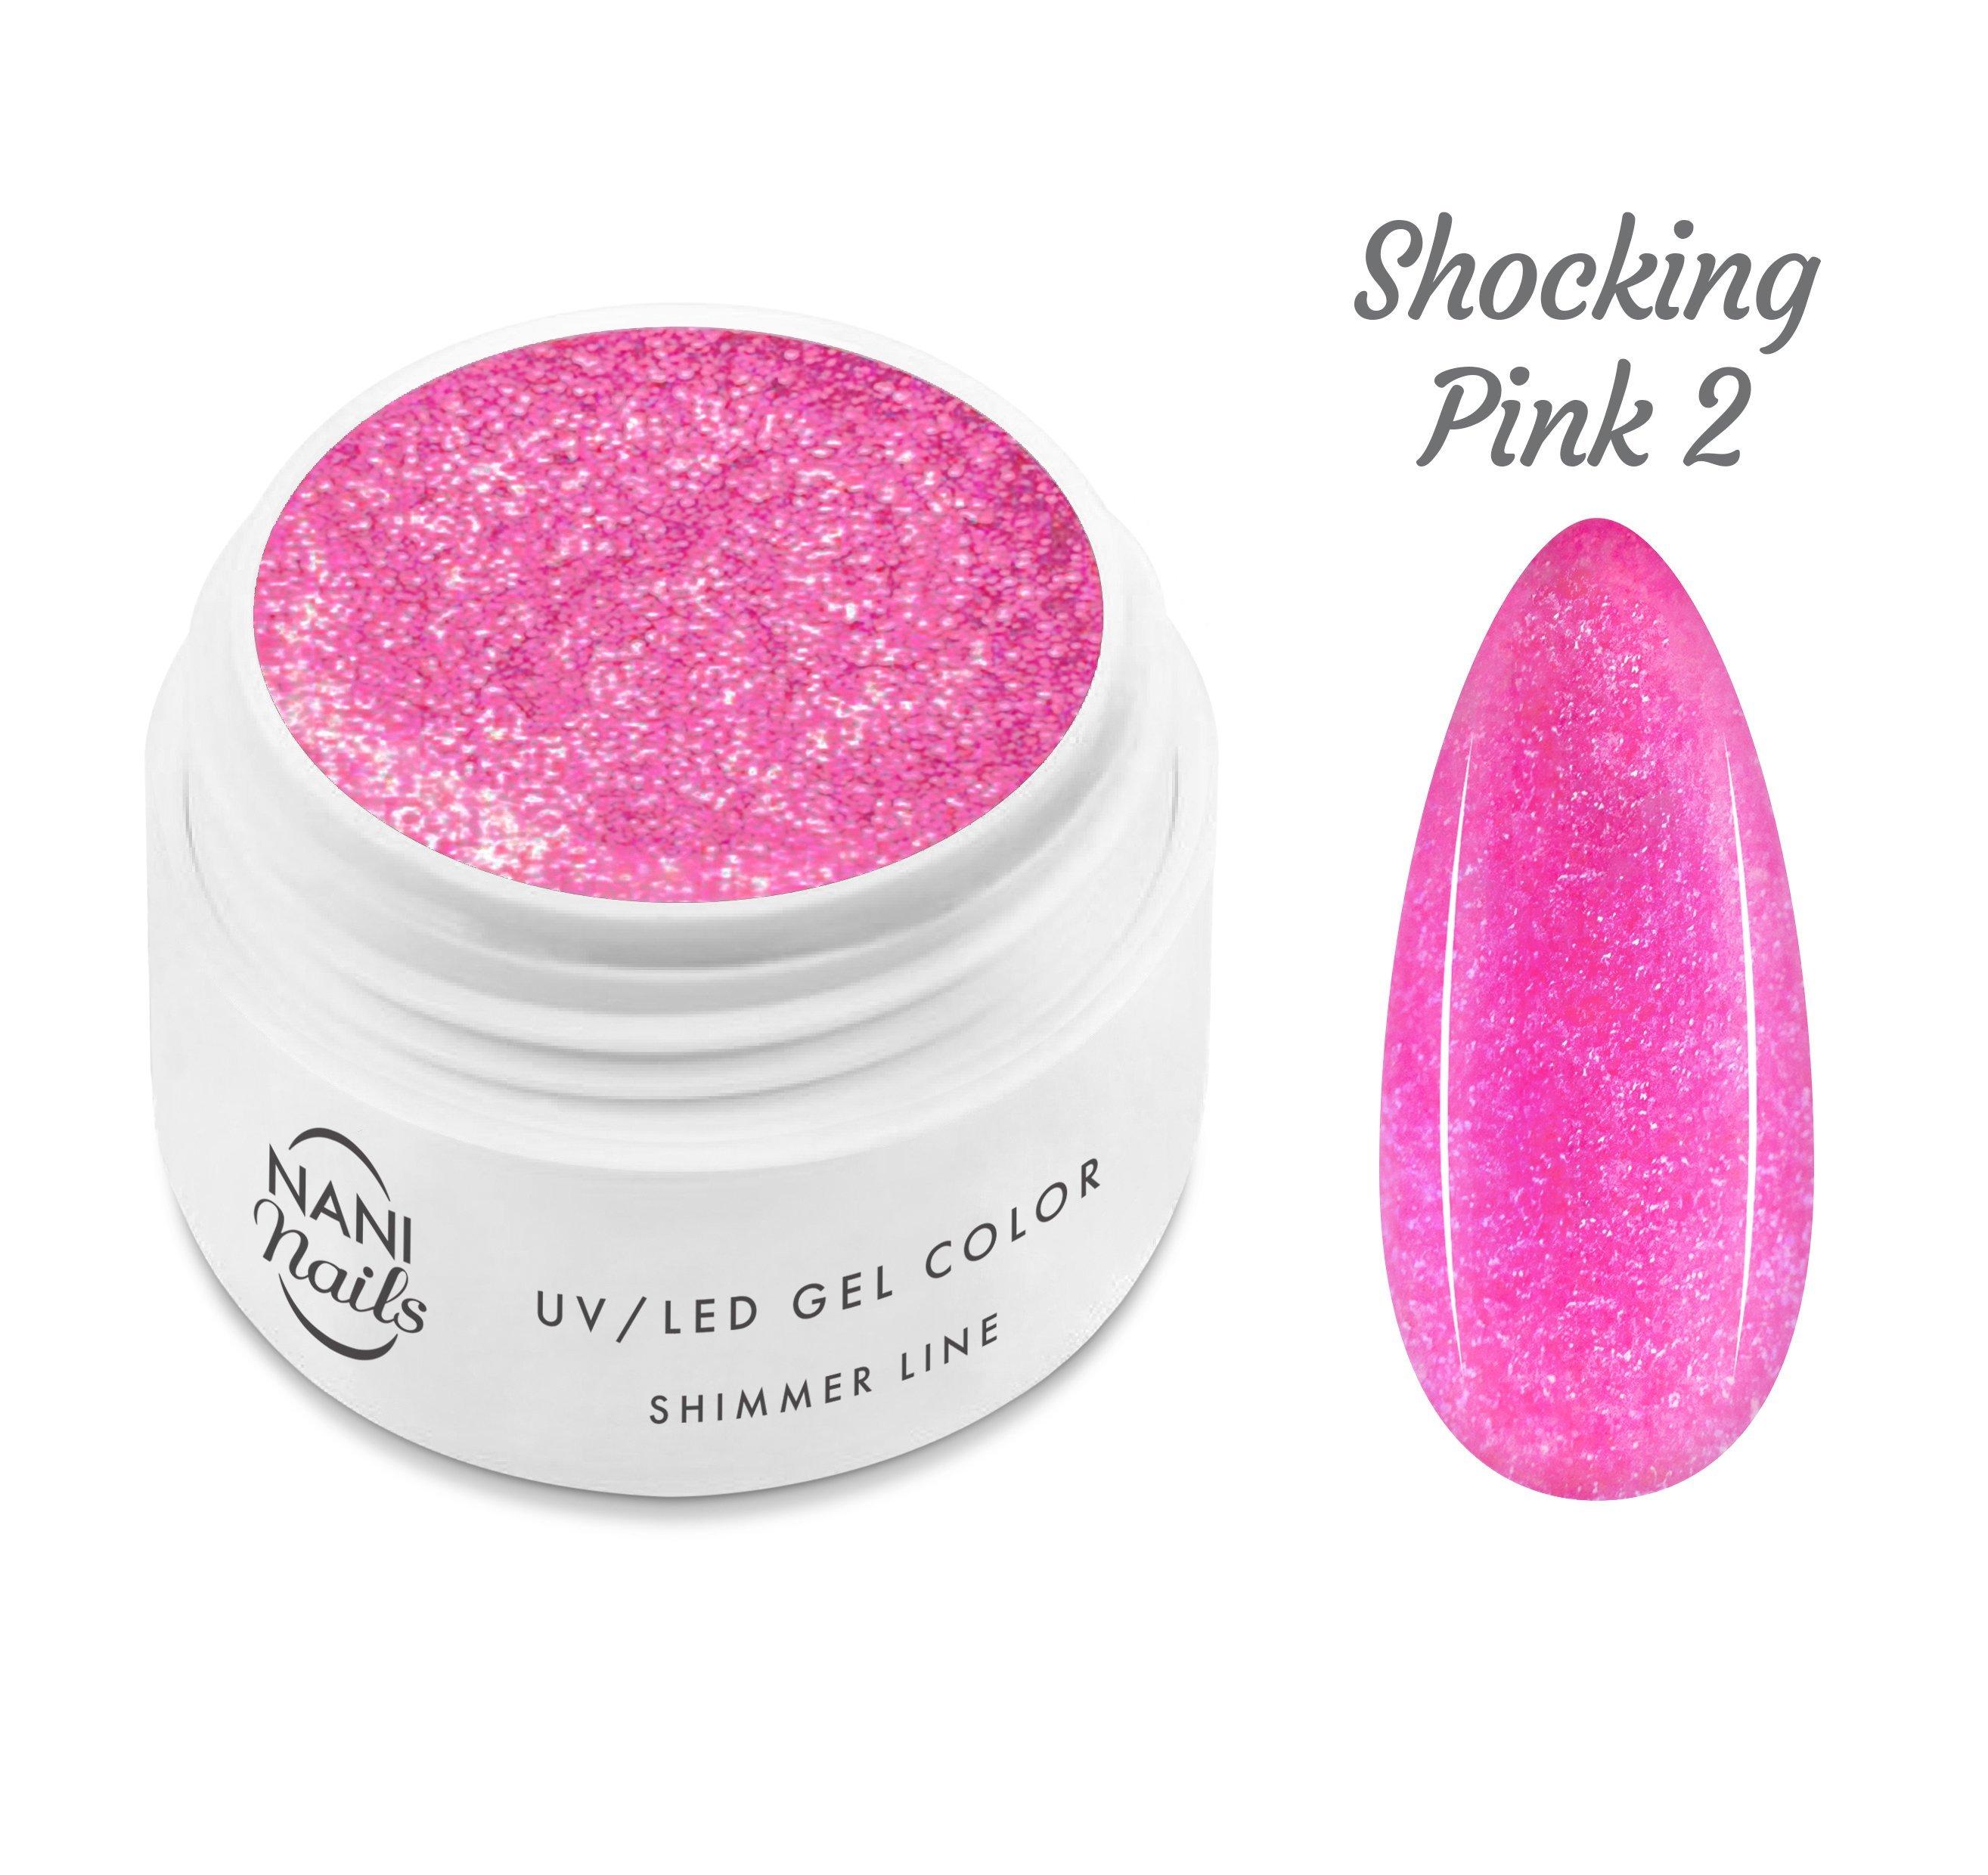 NANI UV gél Shimmer Line 5 ml - Shocking Pink